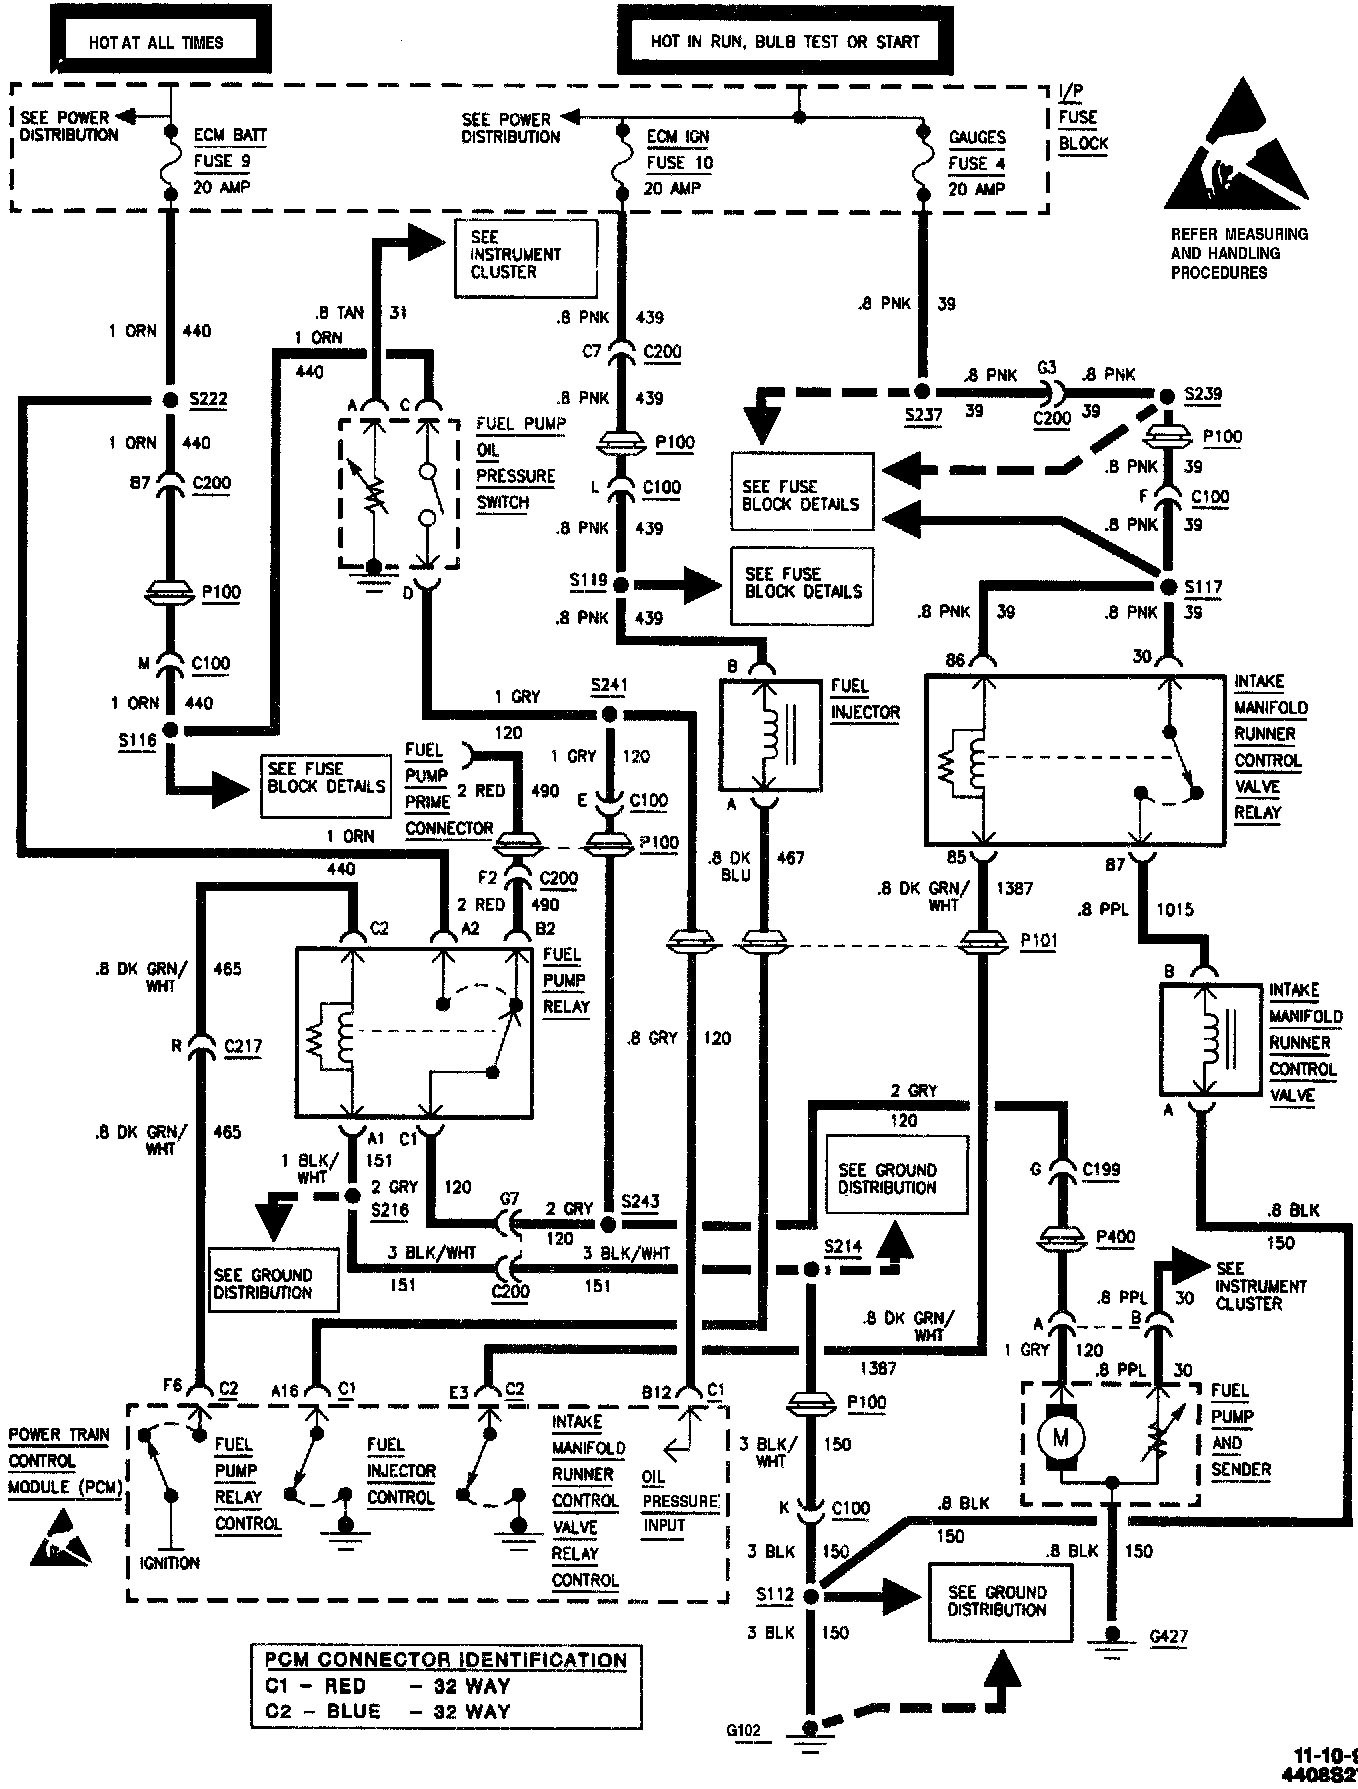 1998 chevy s10 engine diagram diagram 1995 chevy pickup engine rh detoxicrecenze 1995 chevy s10 engine diagram 1995 s10 2 2 engine diagram